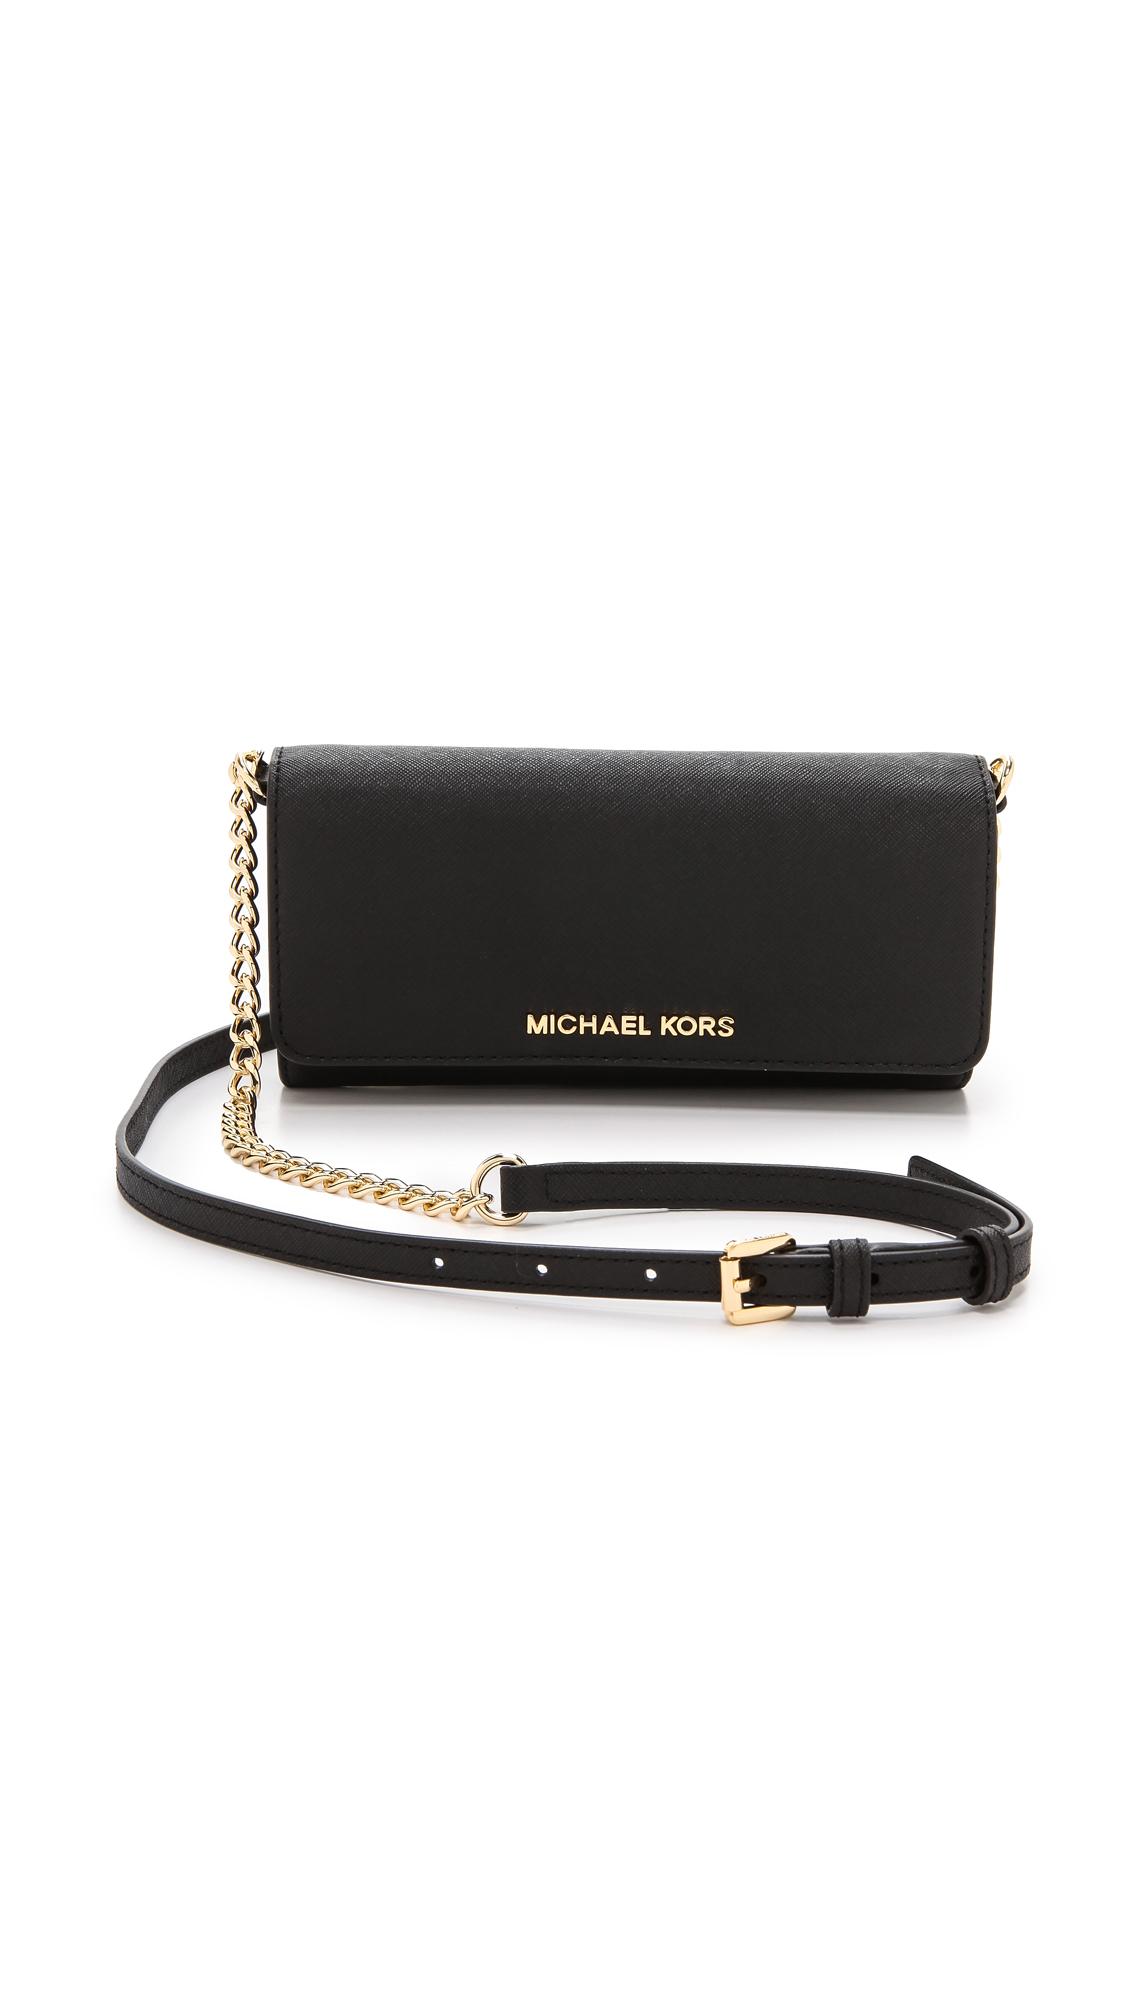 michael kors wallet chain